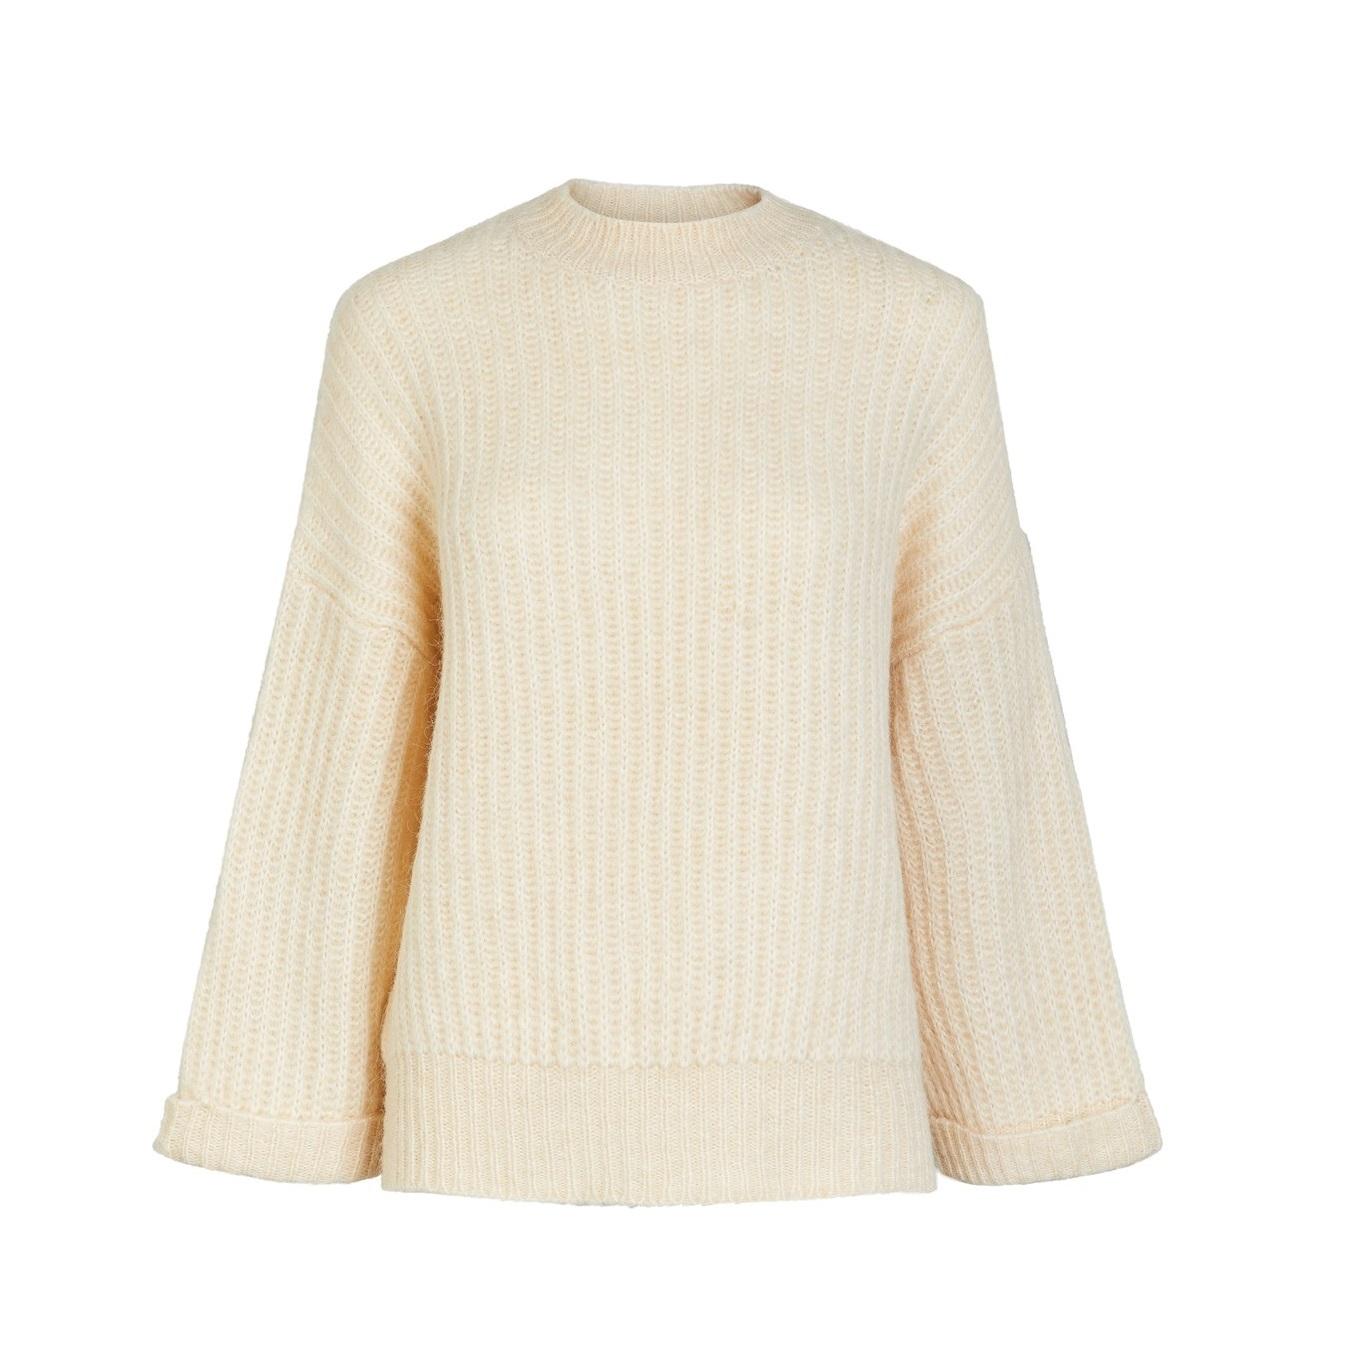 Sunday Knit Cream